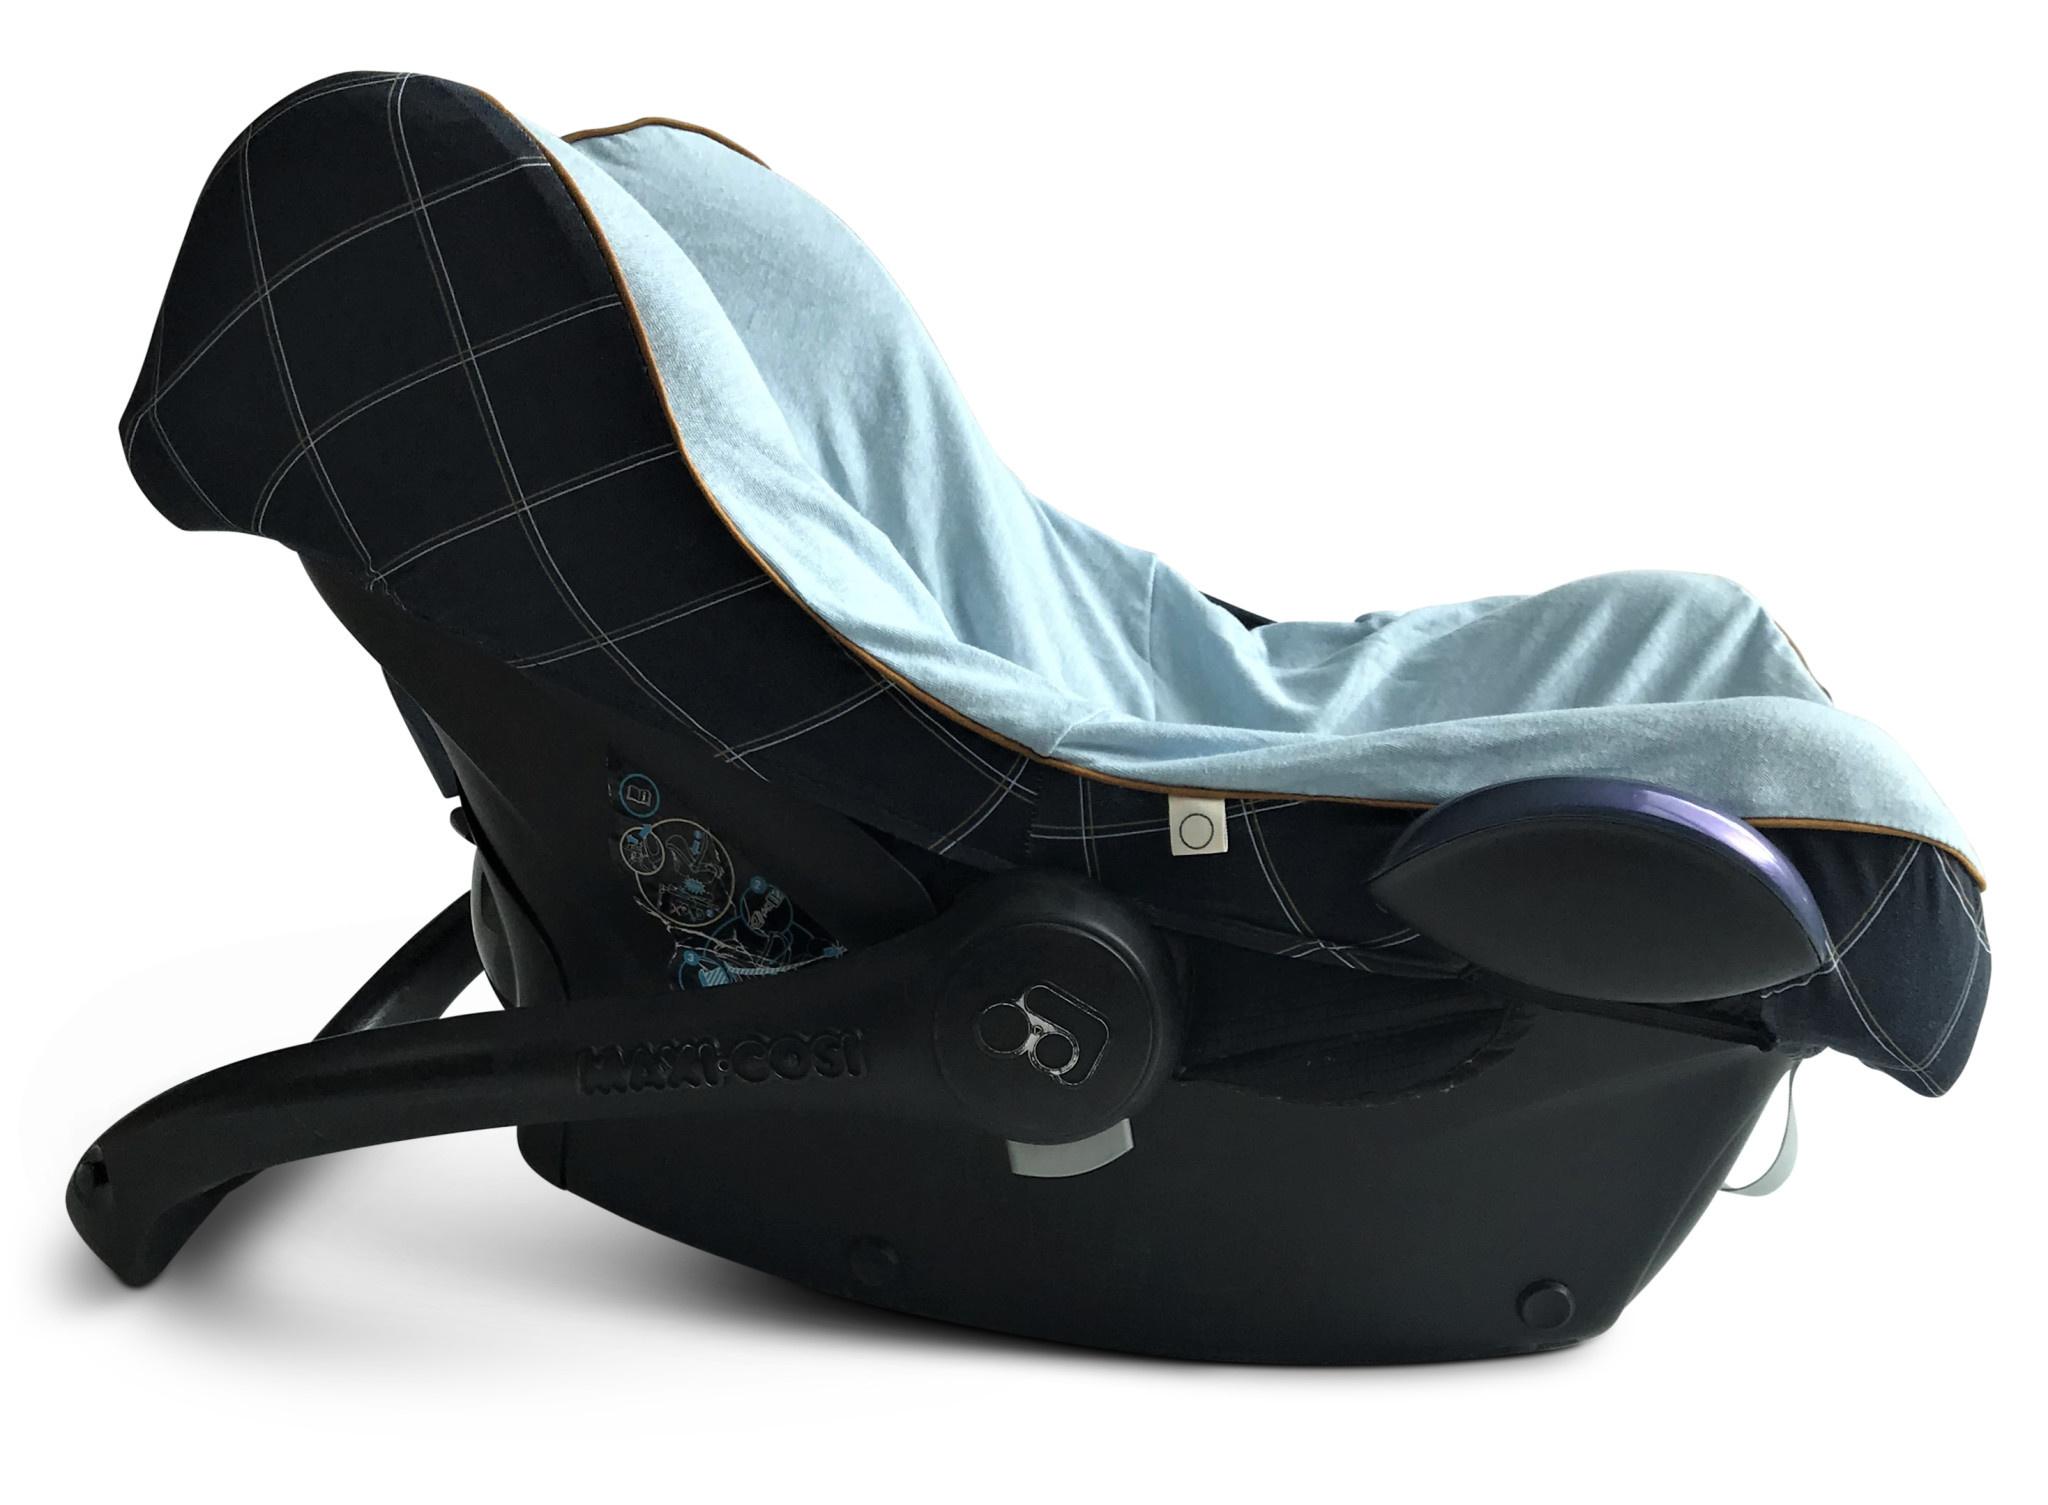 Hoes autostoel maxi cosi alfie-1